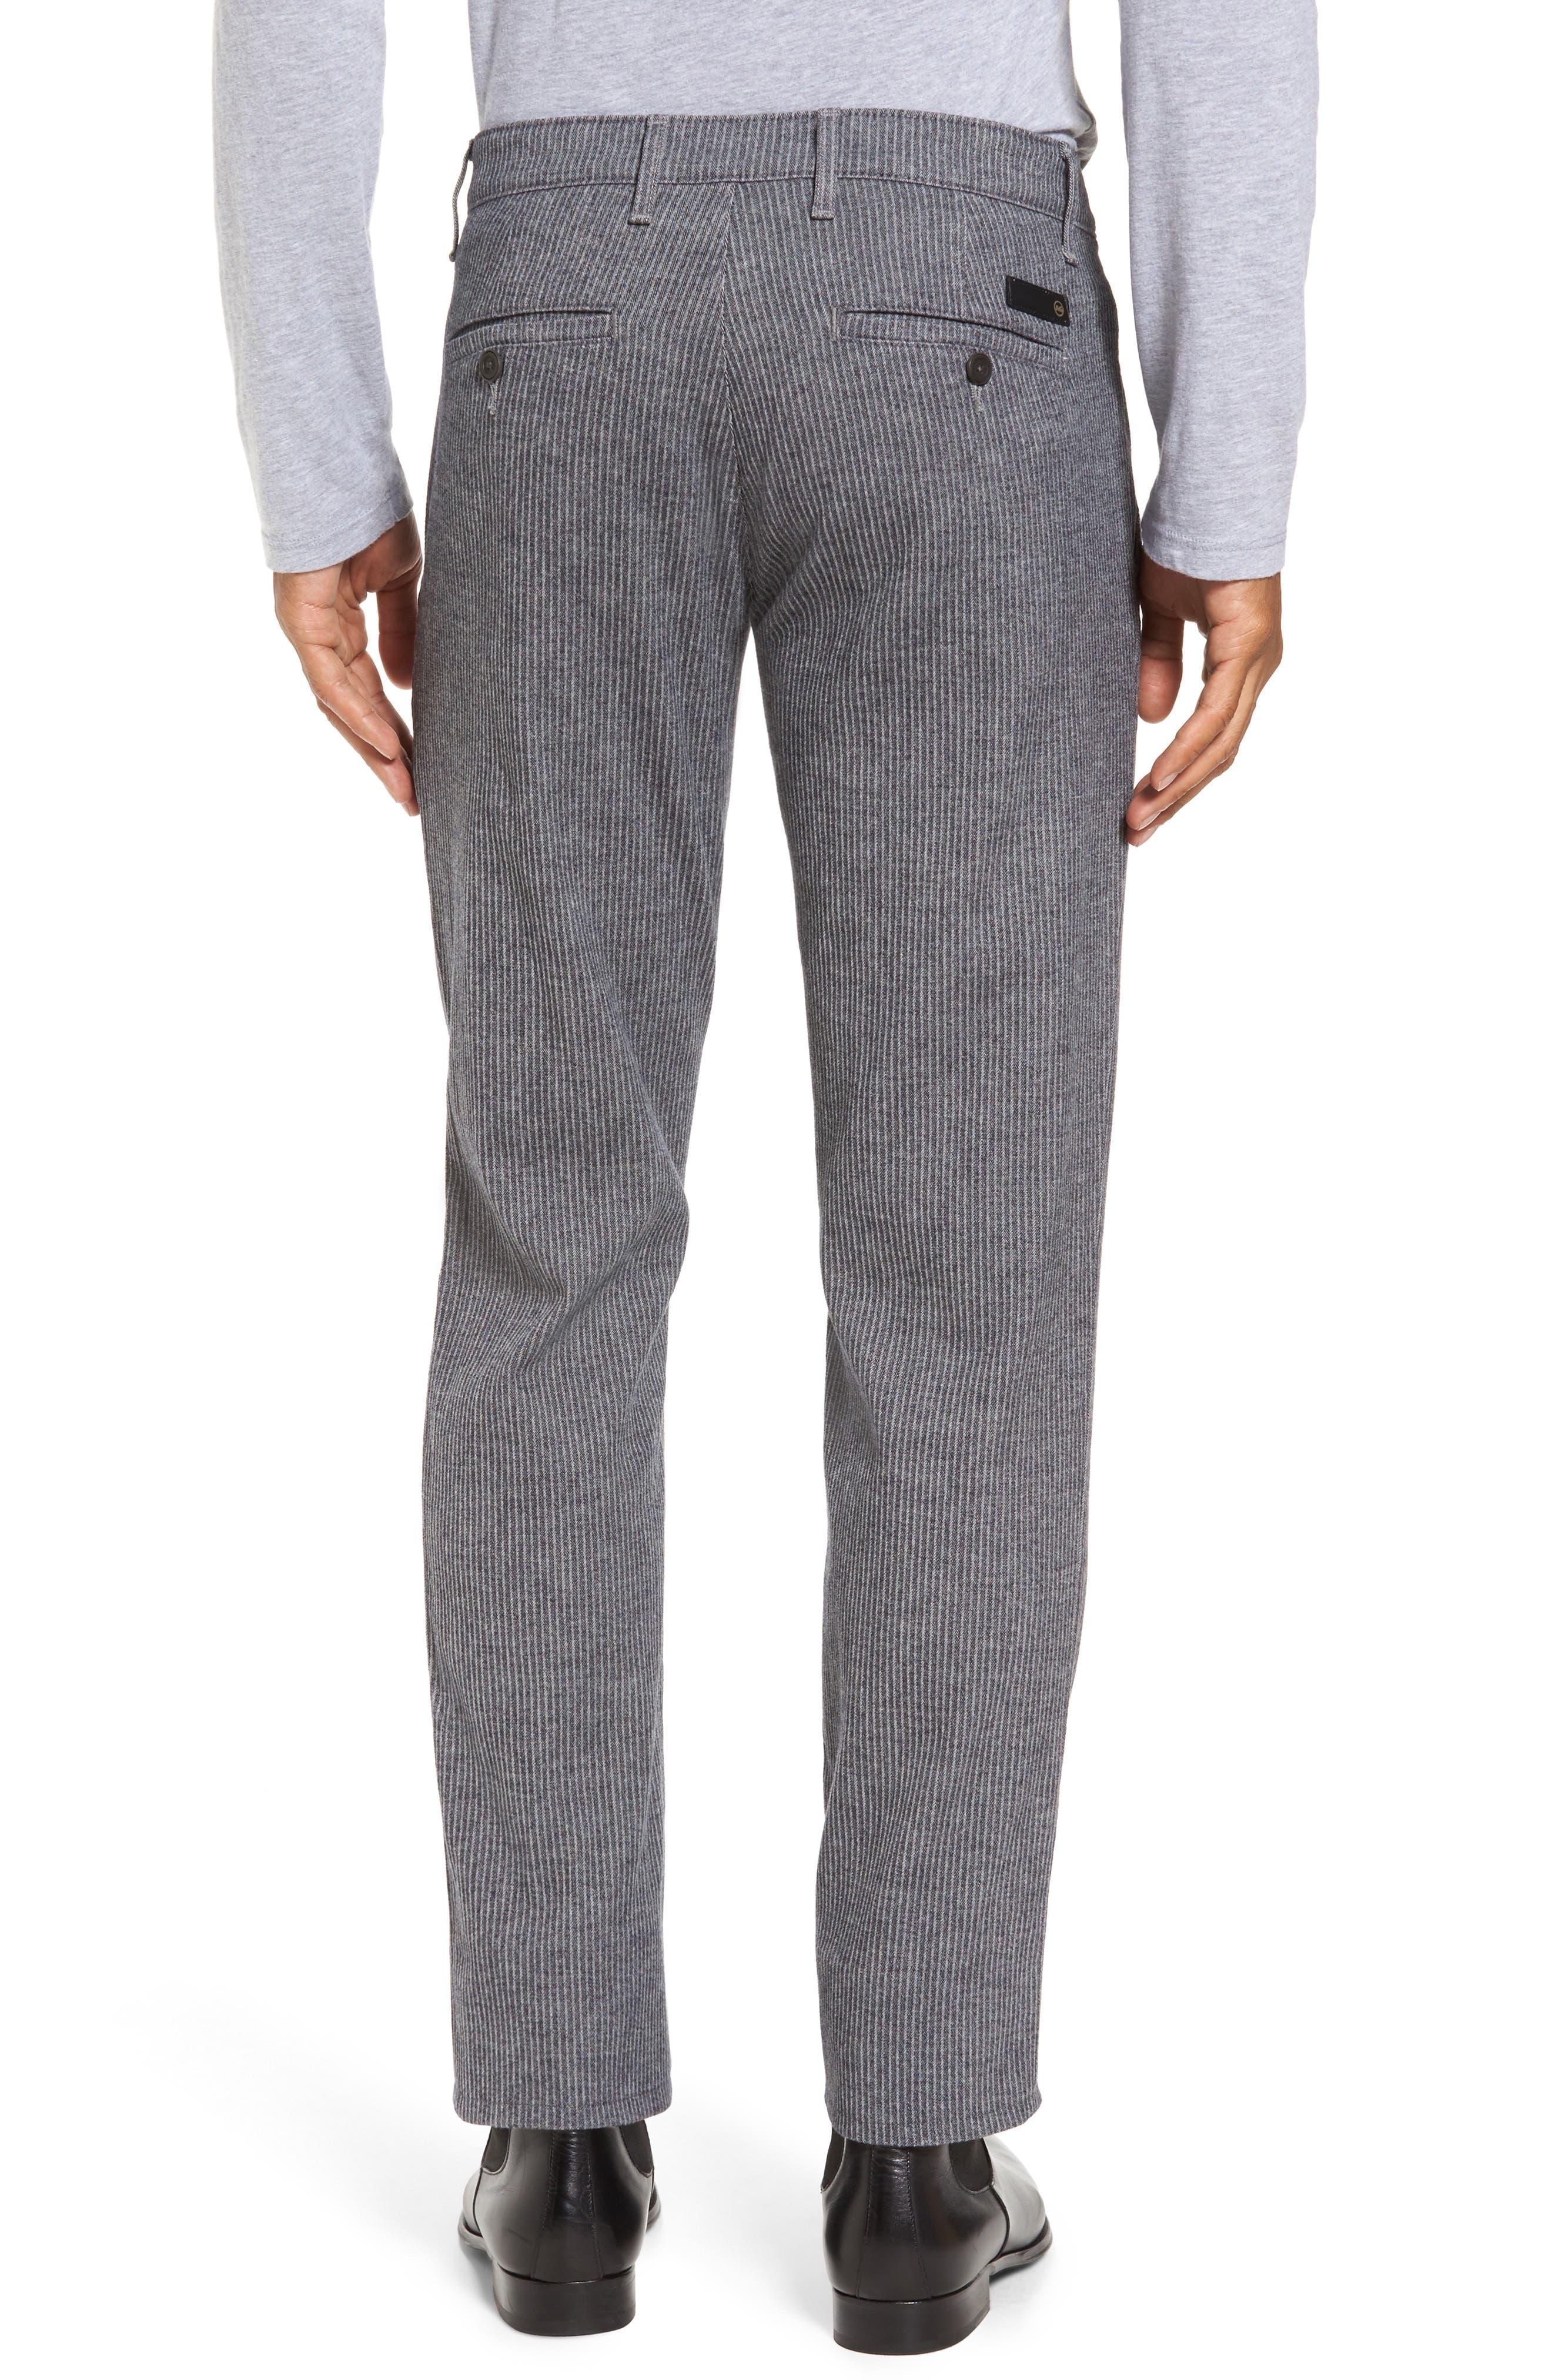 Marshall Slim Fit Pinstripe Pants,                             Alternate thumbnail 2, color,                             028